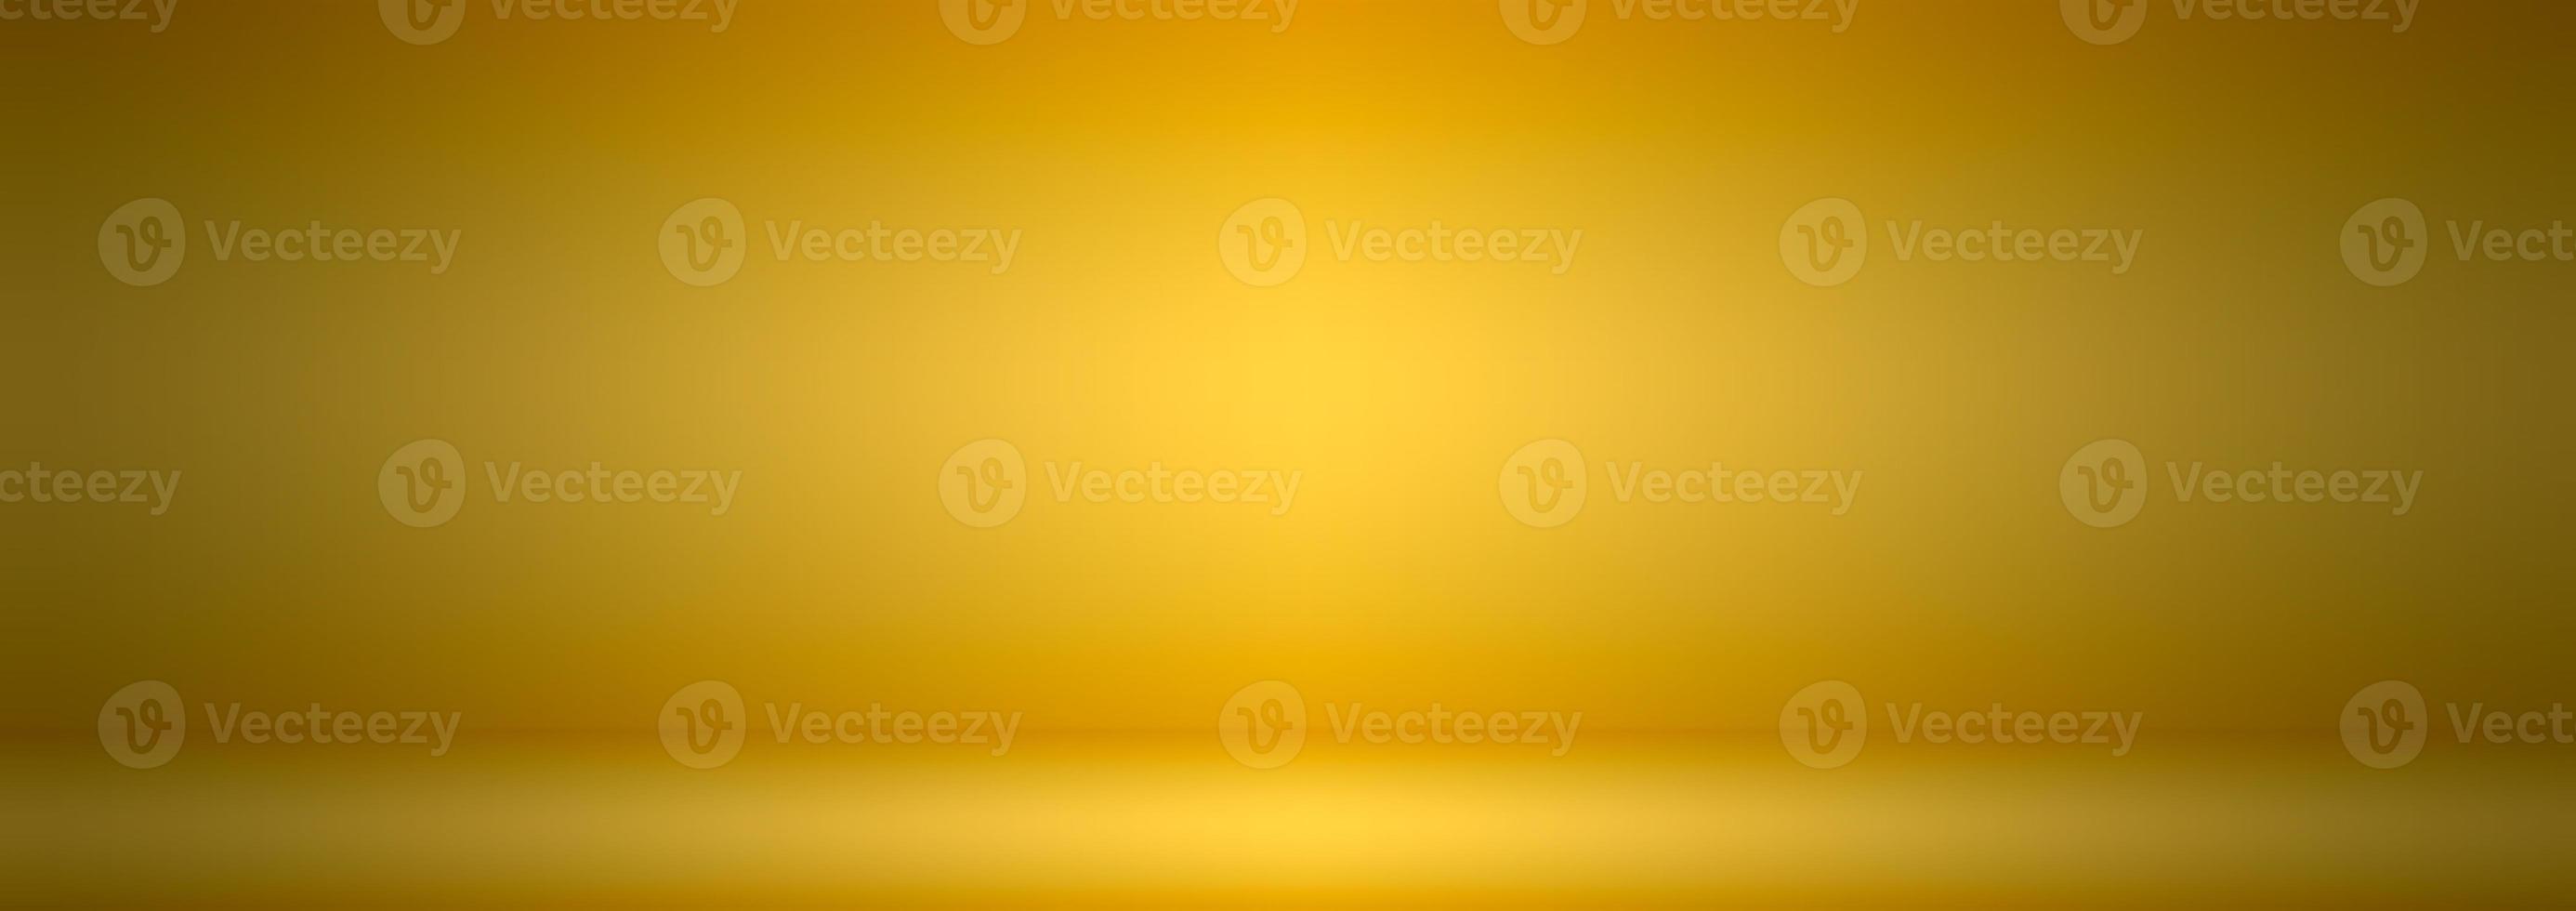 fond de studio et de mur jaune et orange photo